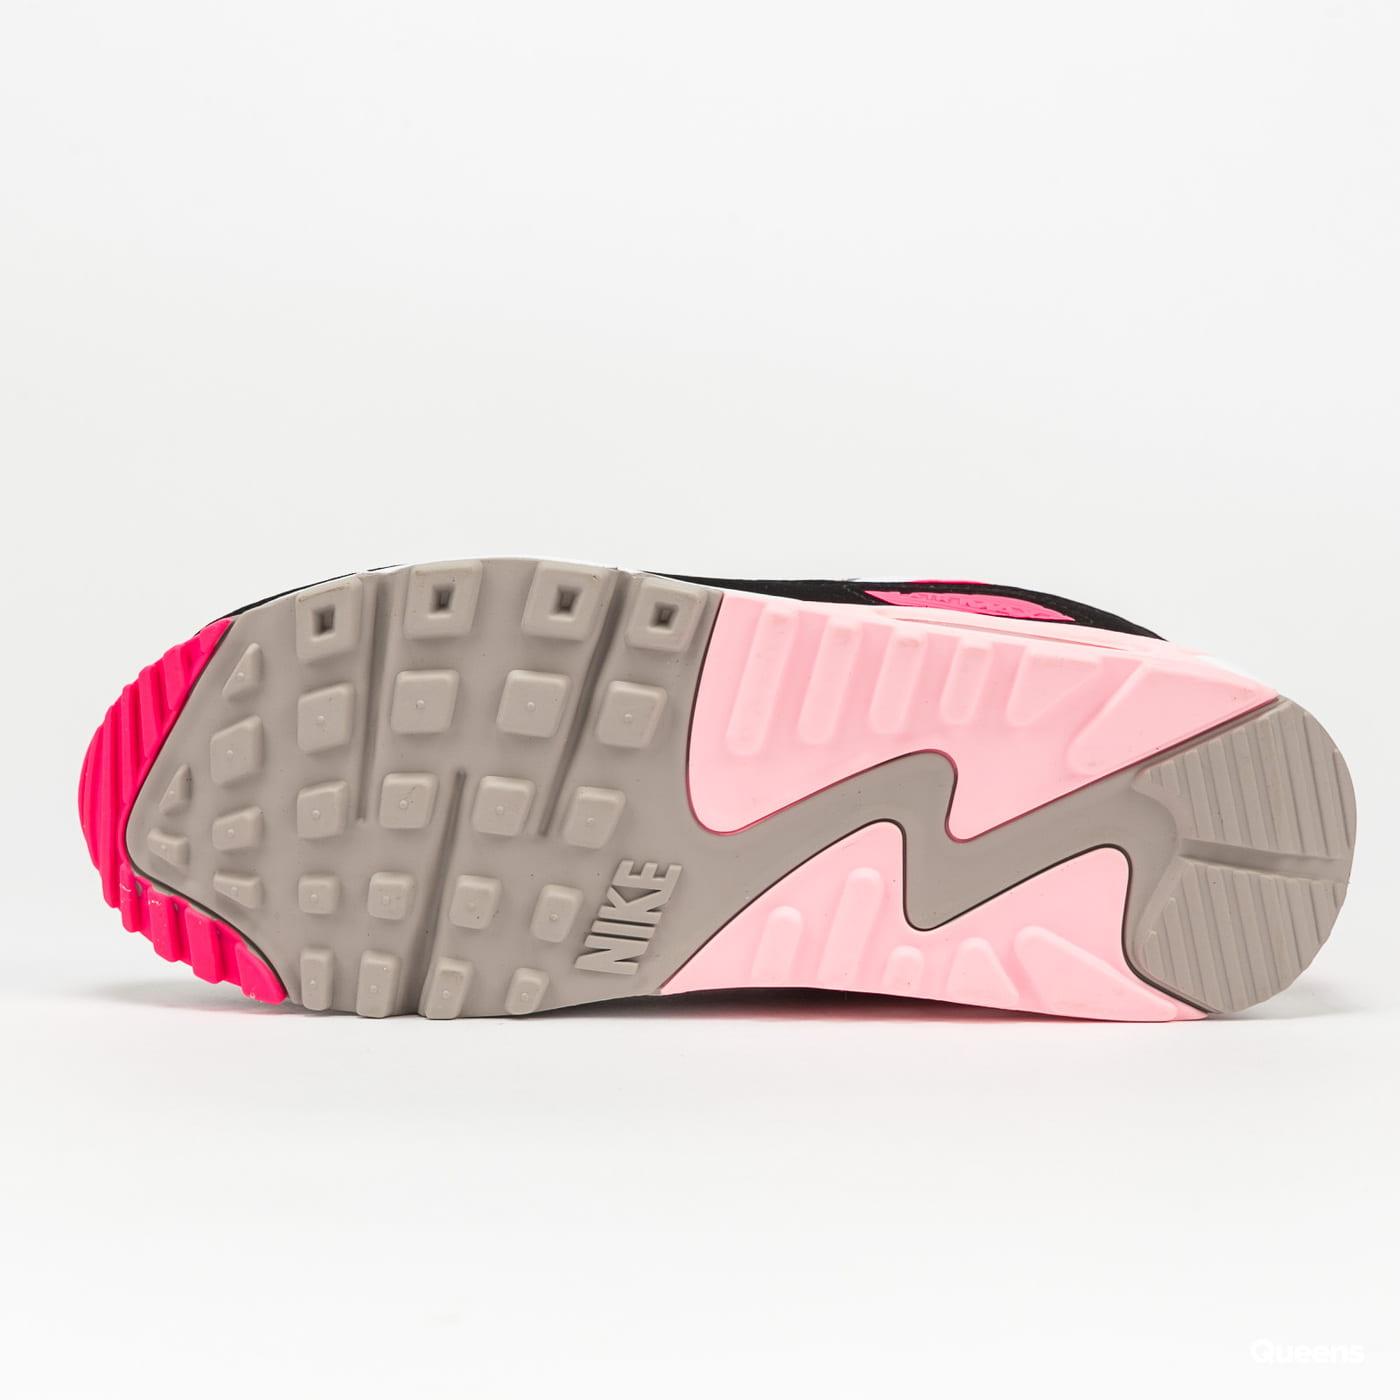 Nike WMNS Air Max 90 white / hyper pink - black